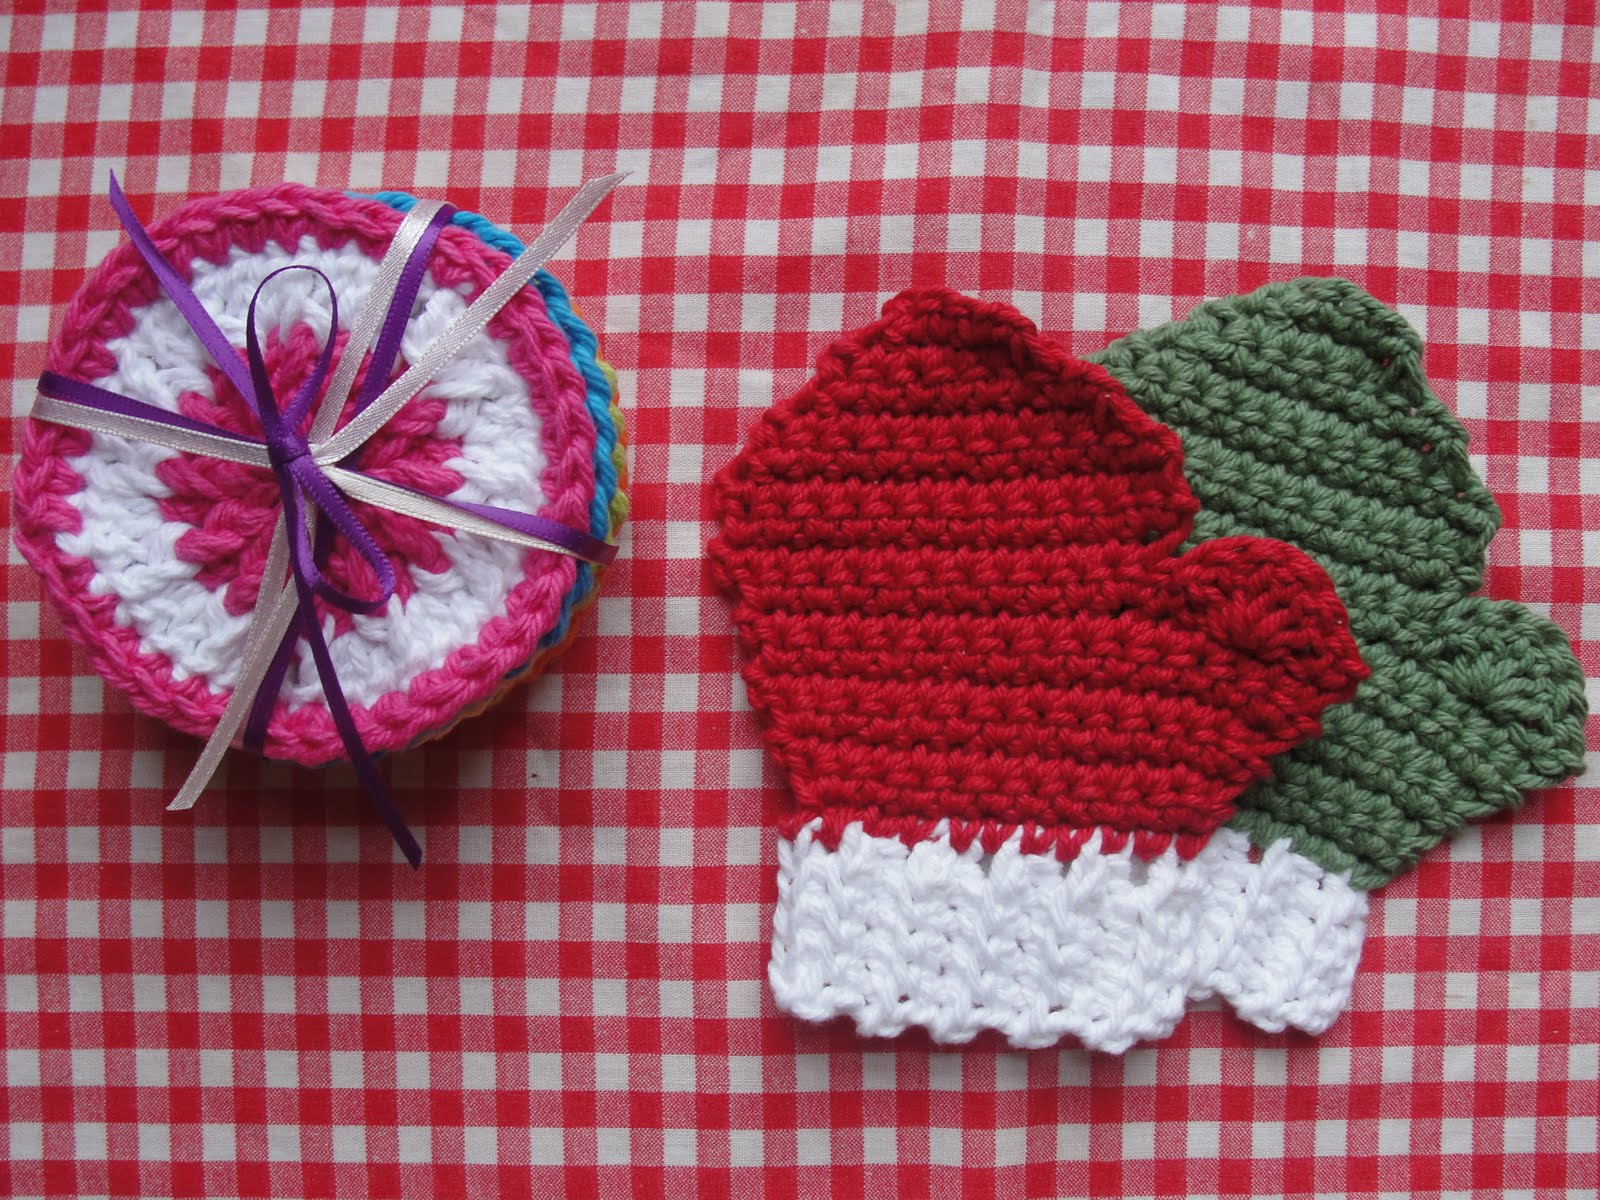 Crochet Patterns Only Spiral Scrubbie : TAWASHI CROCHET PATTERNS - Easy Crochet Patterns